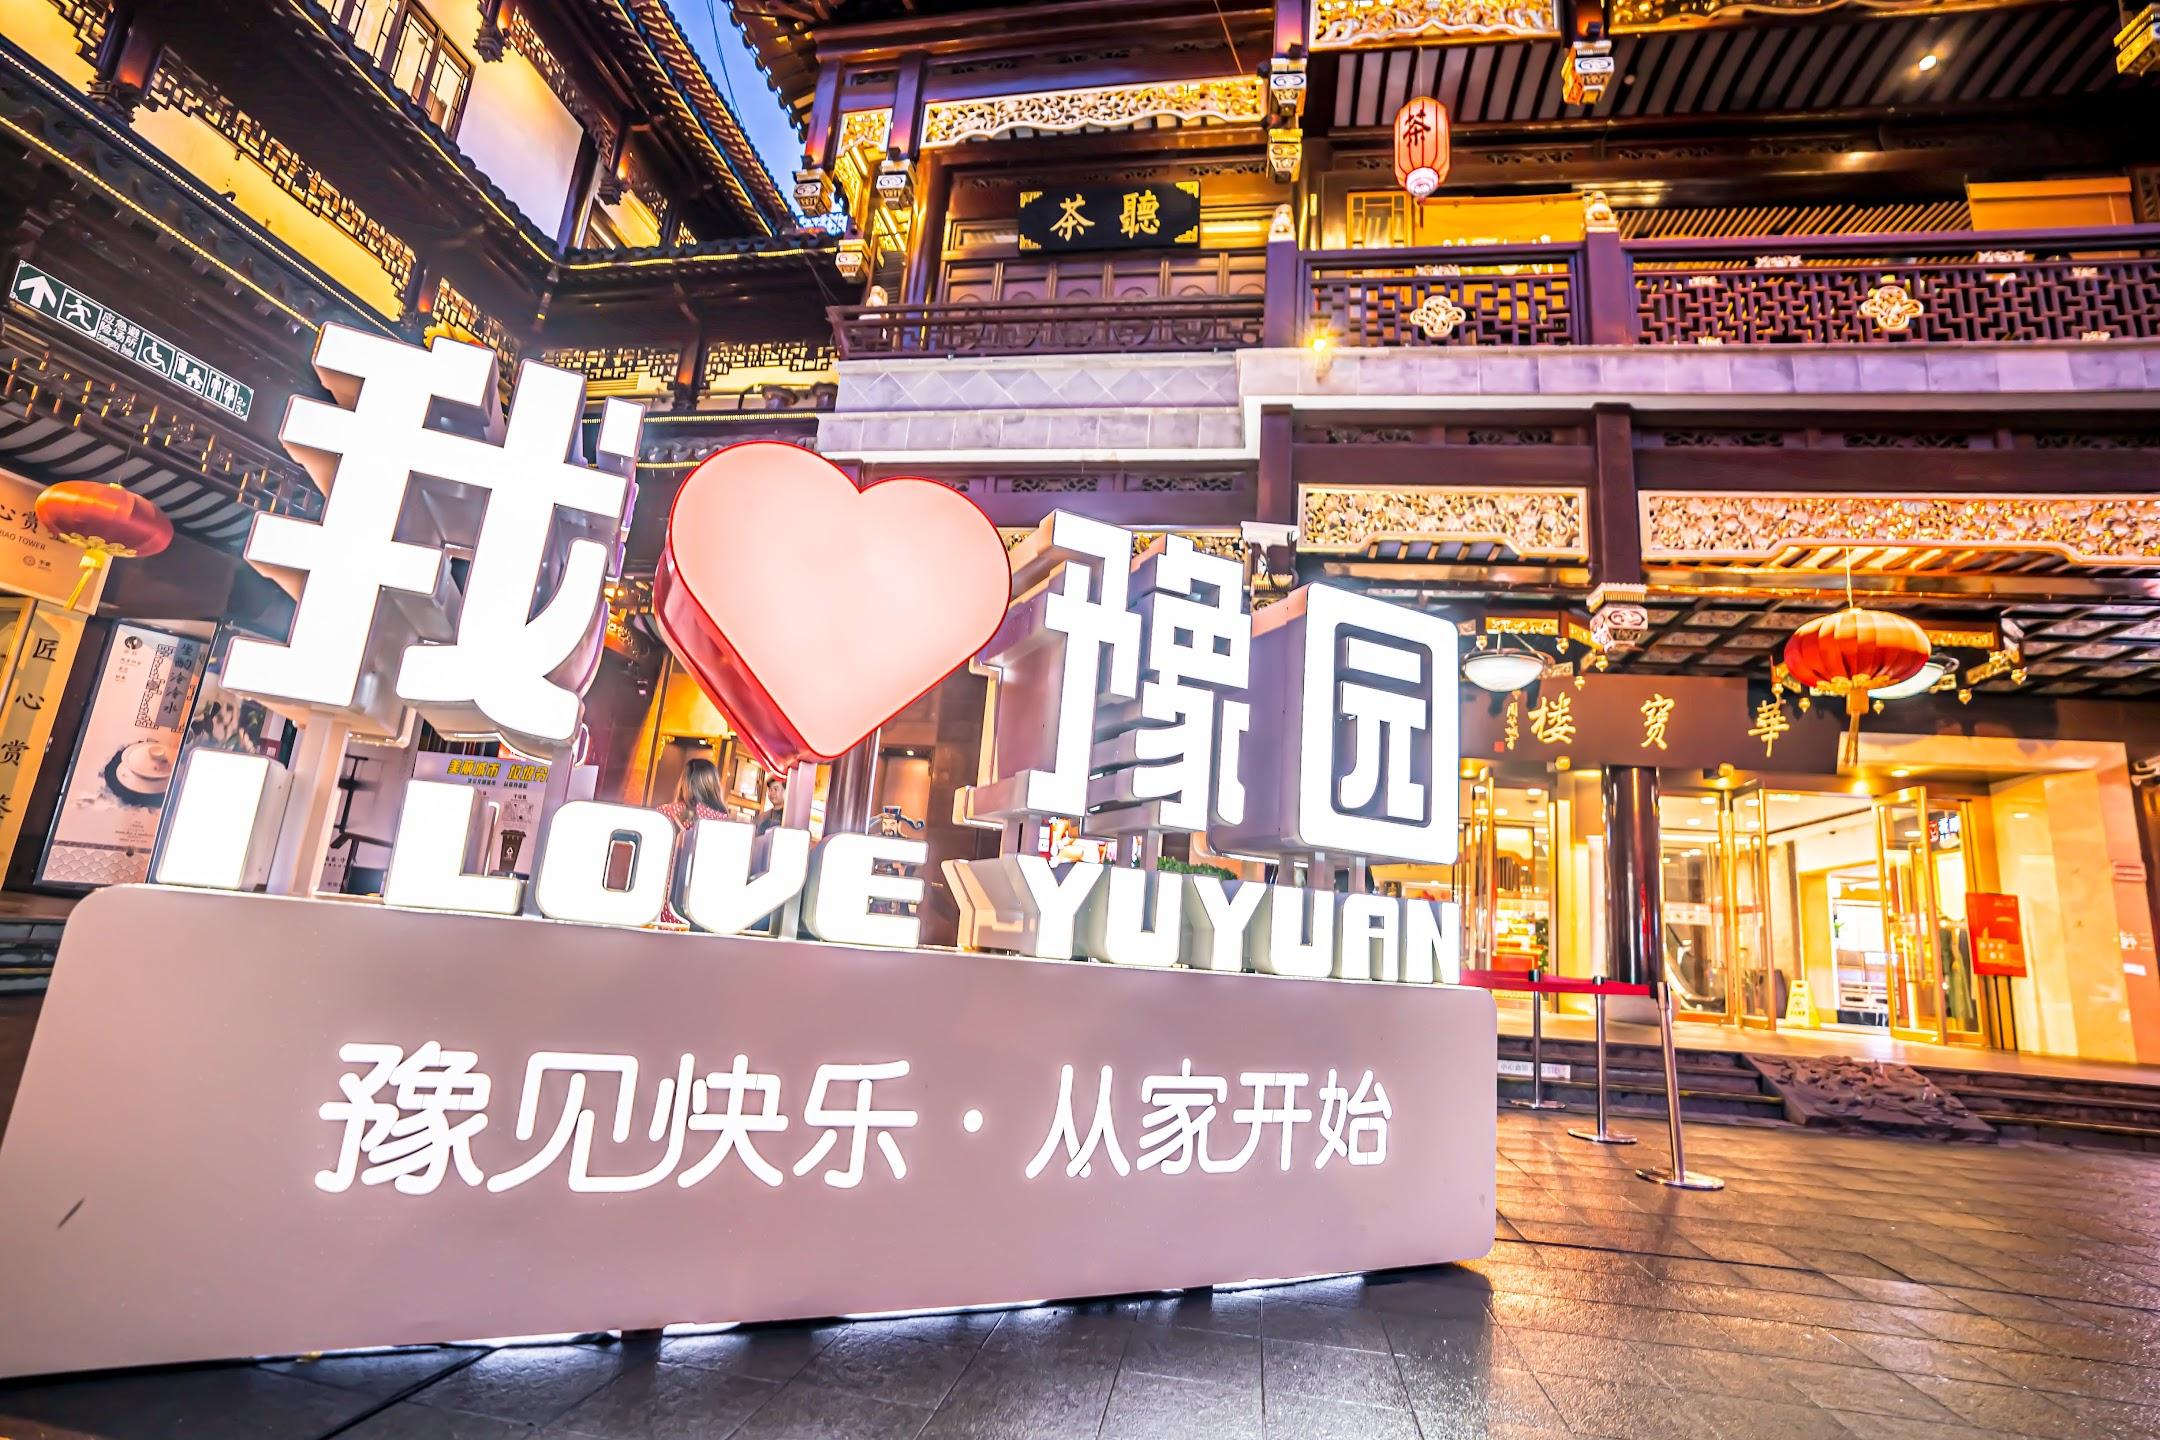 Shanghai Yuyuan Light-up2